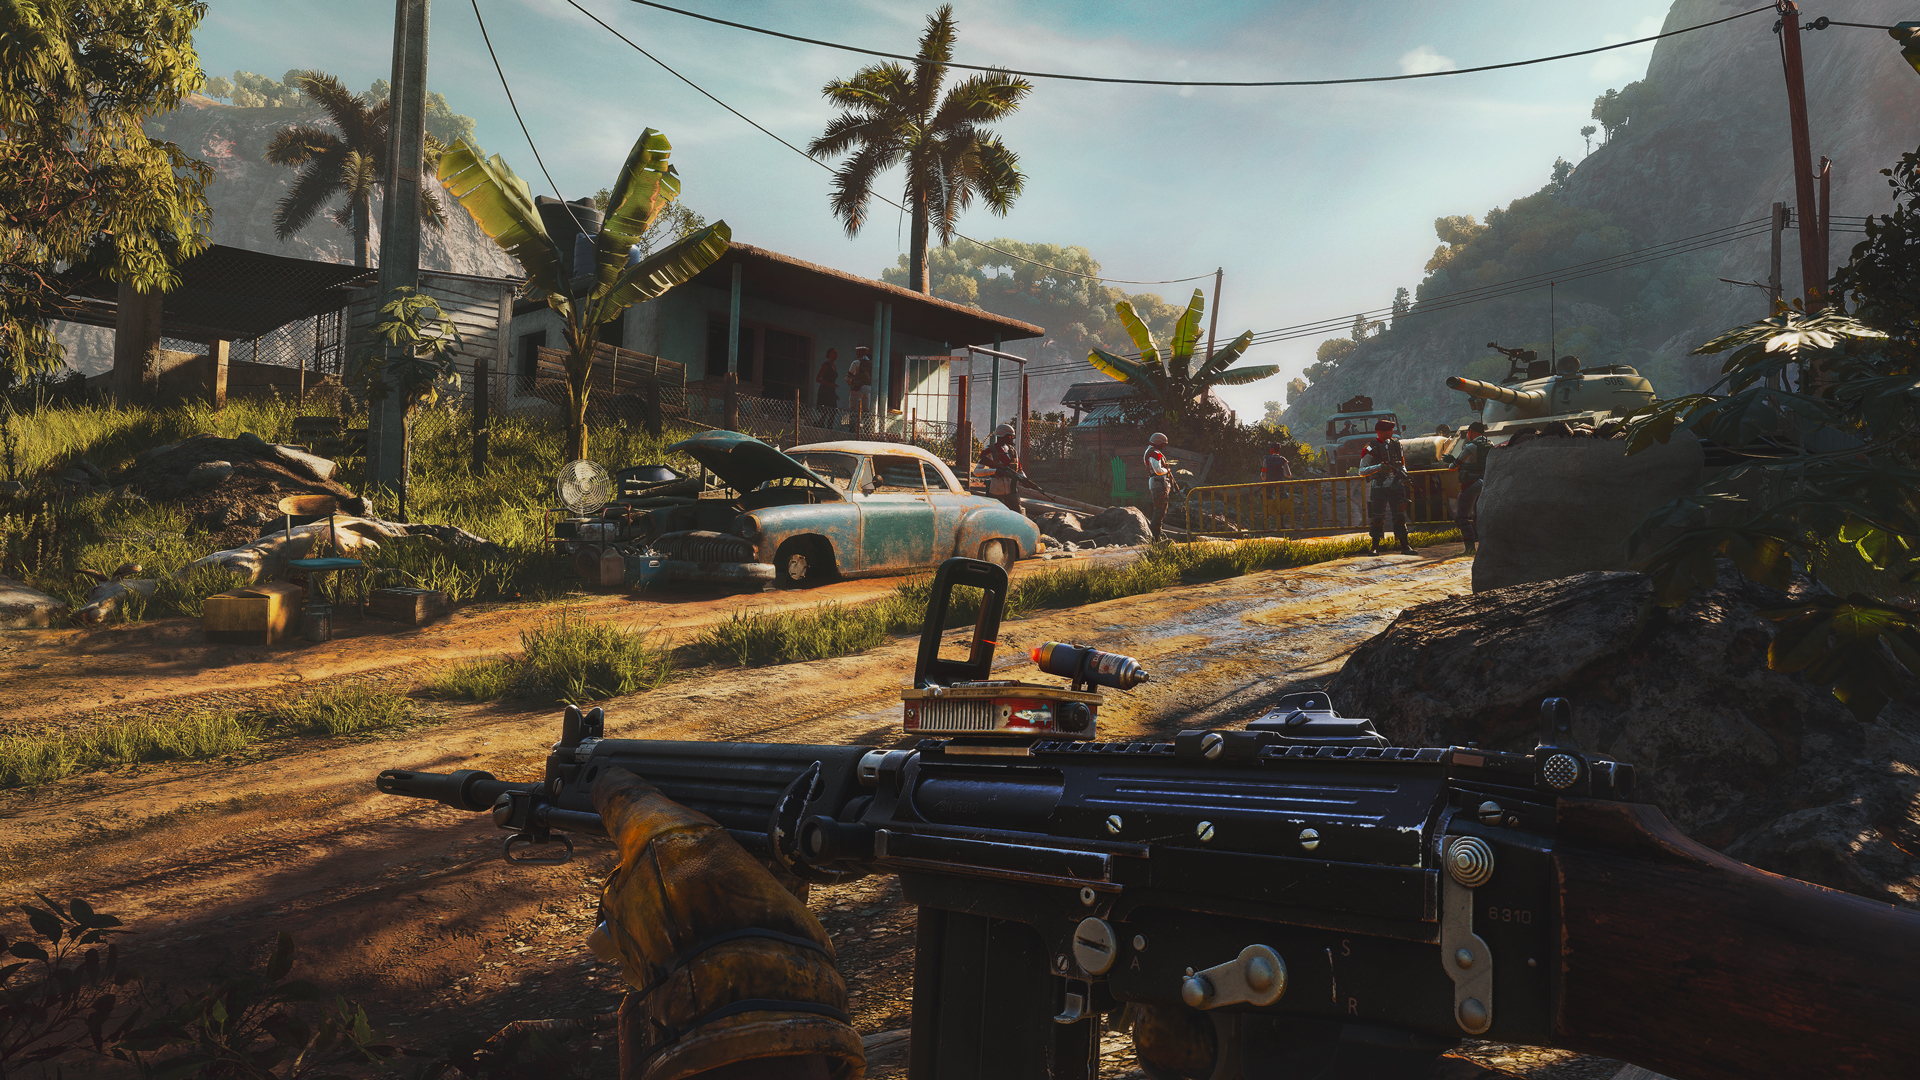 Far Cry 6 rating hints at the darker side of Yara